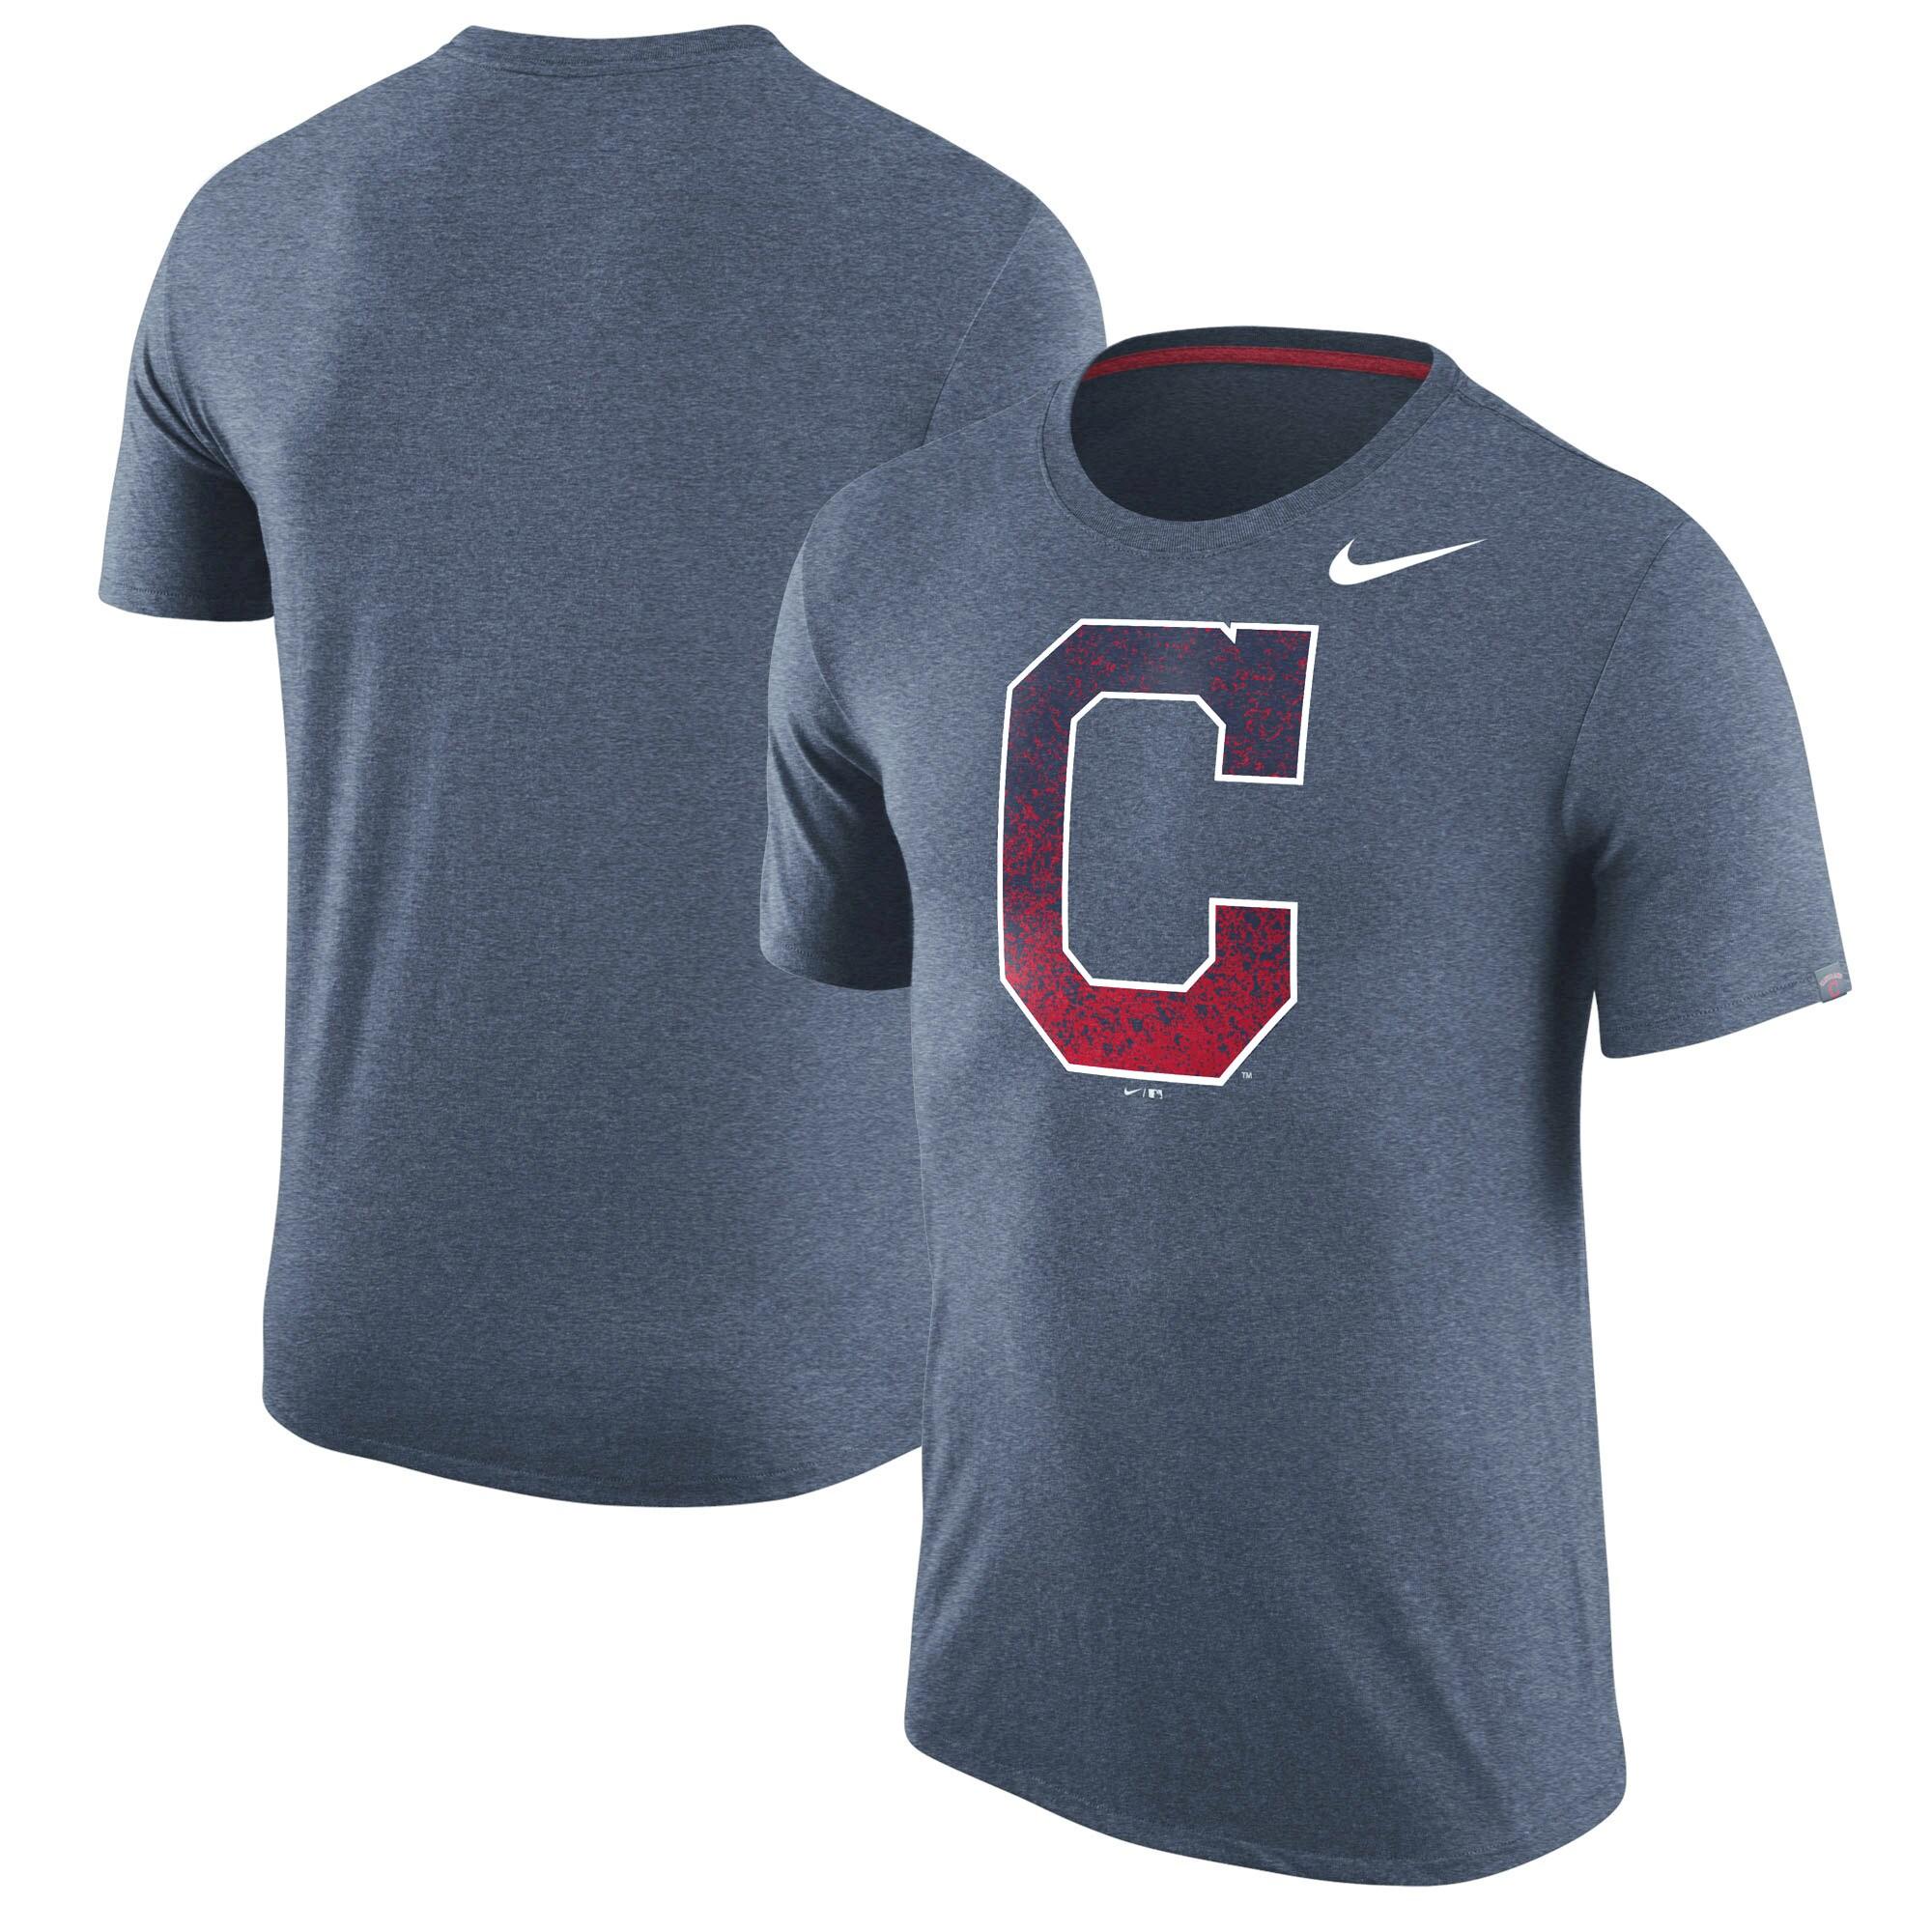 Cleveland Indians Nike Tri-Blend T-Shirt - Heathered Navy